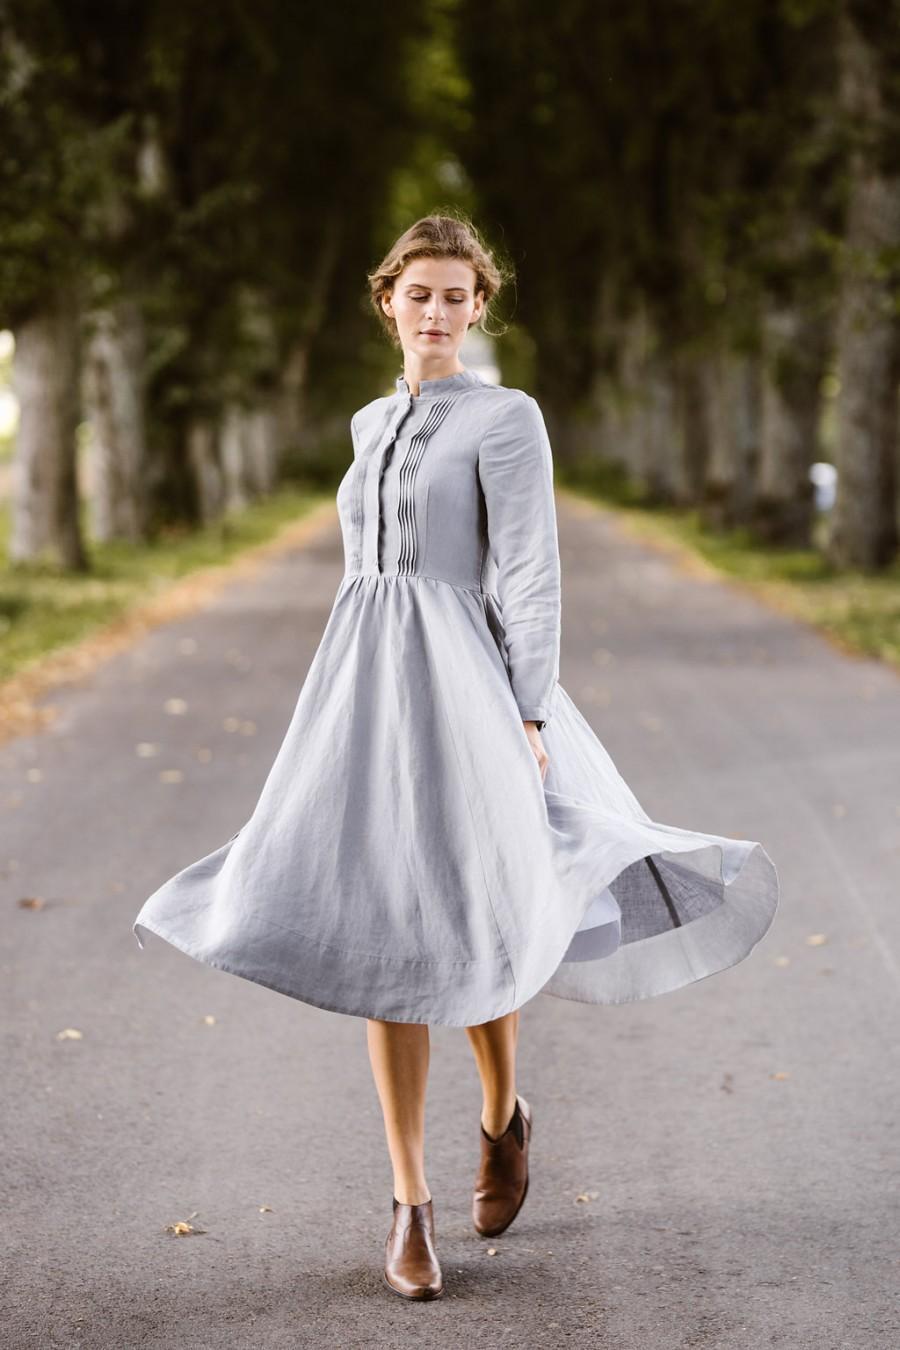 Mariage - Sondeflor Dress, Vintage Style, Linen Clothing, Linen Midi Dress, Silver Dress, Shirt Dress, Elegant Summer Dress, Linen Outfit/Elisa